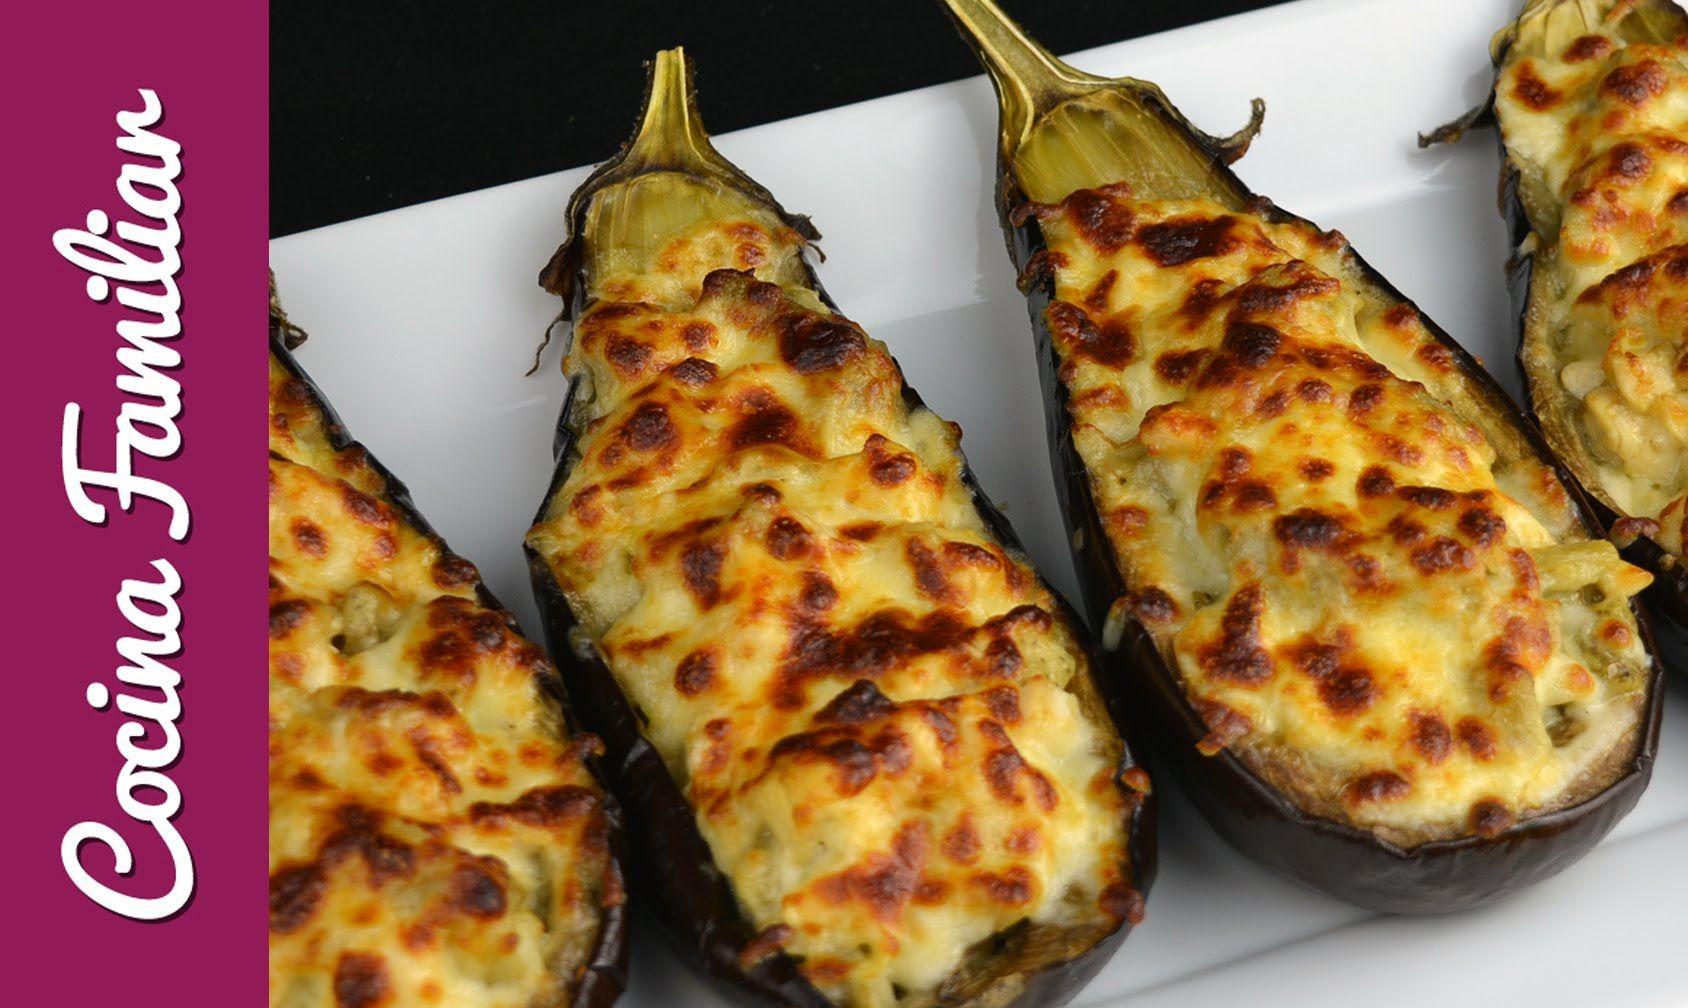 Berenjenas rellenas receta casera javier romero vege for Javier romero cocina